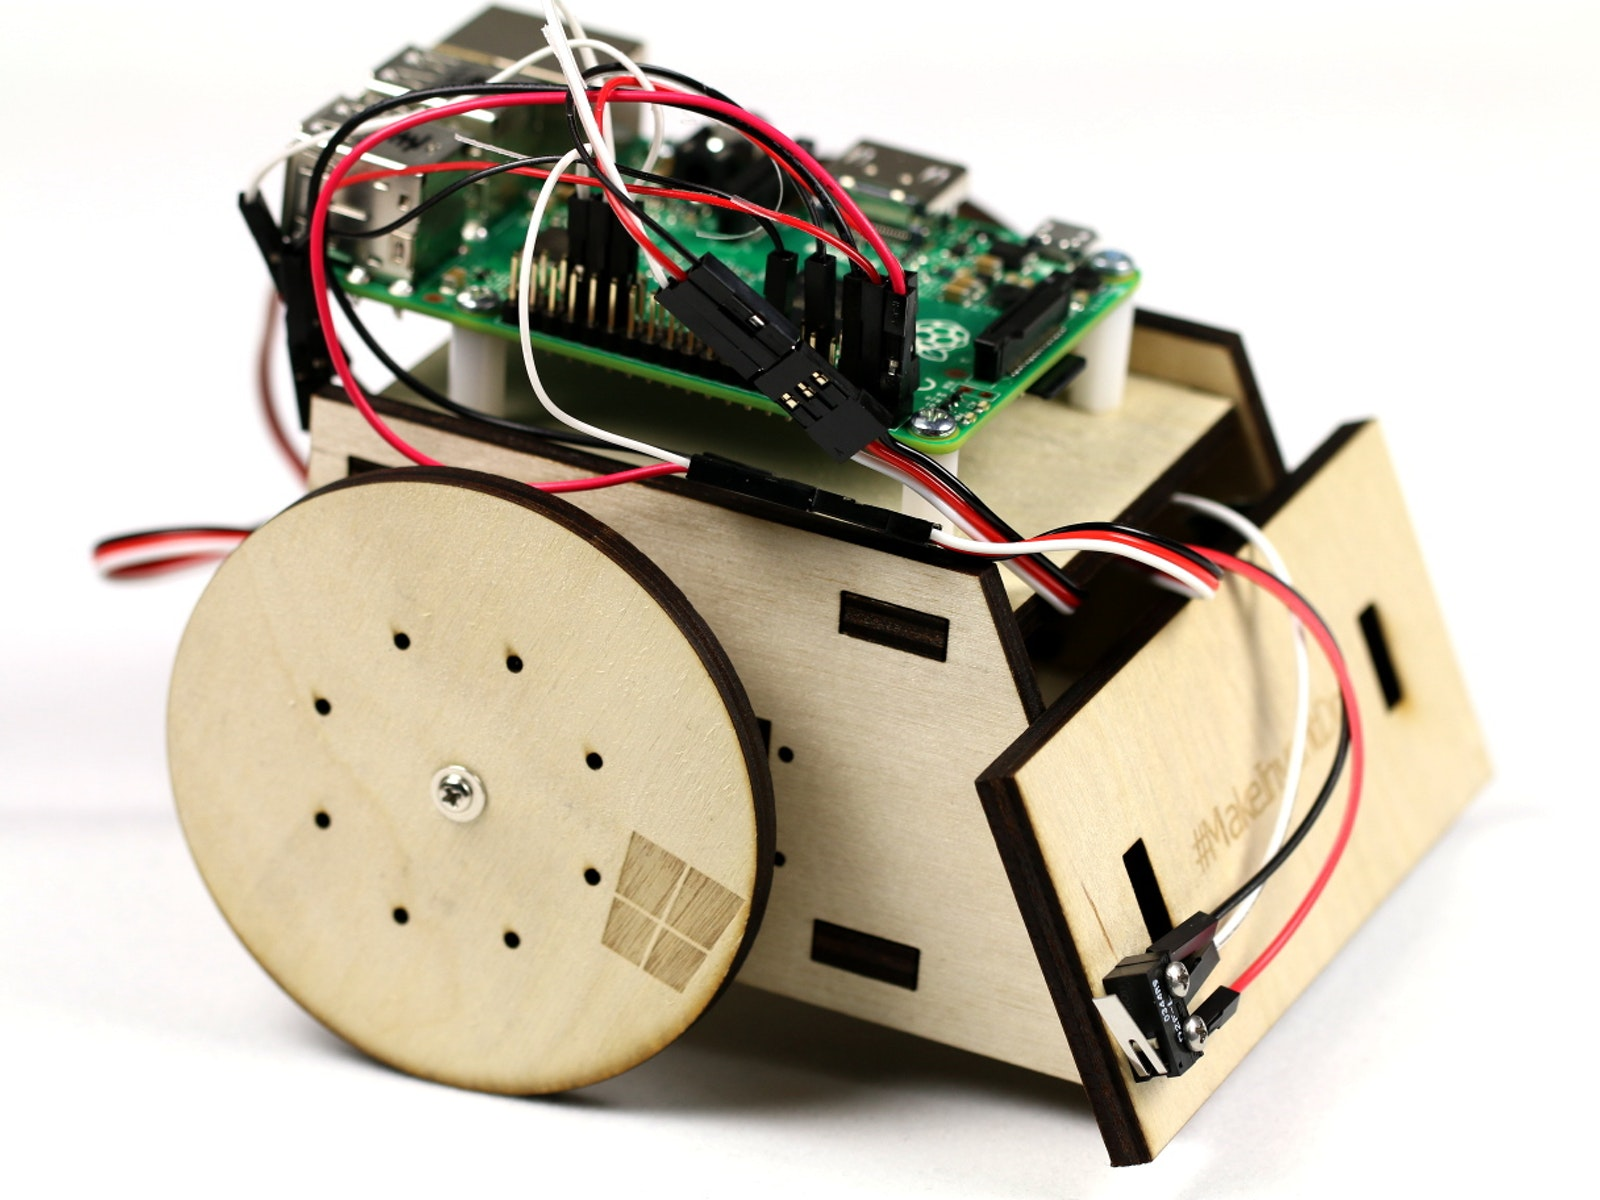 Robot kit Windows 10 Raspberry Pi 2